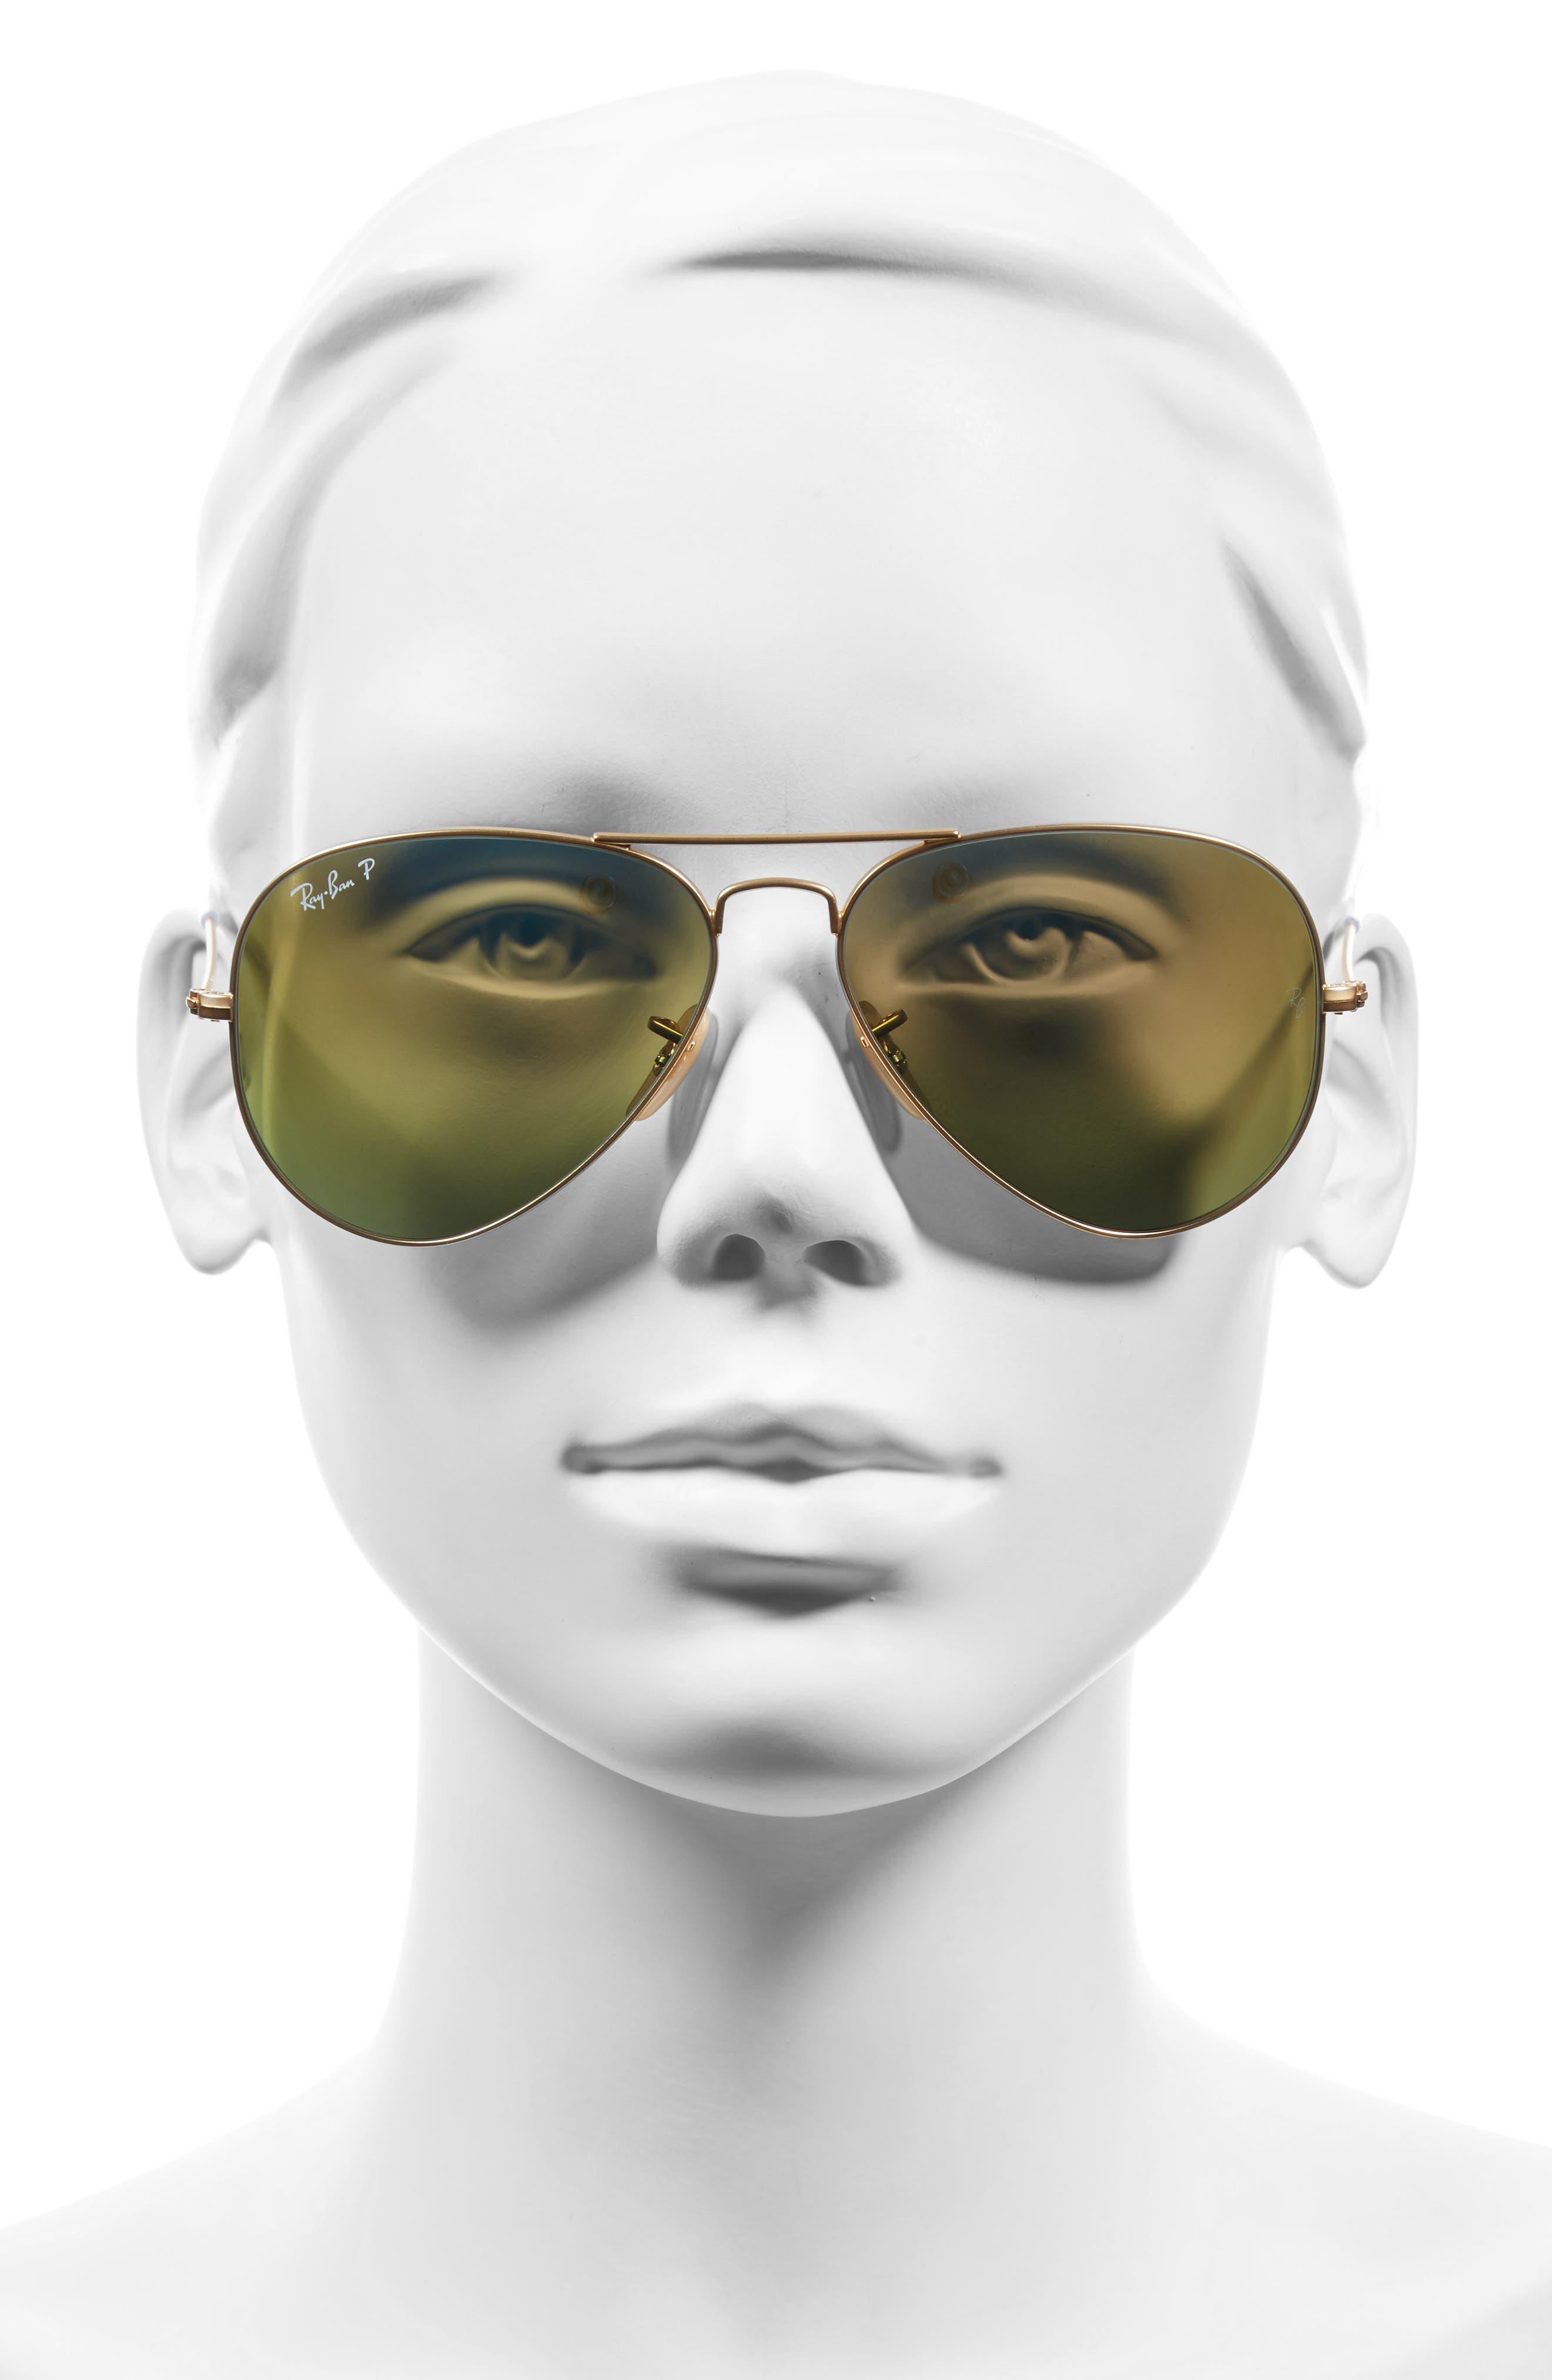 58mm Polarized Aviator Sunglasses,                             Alternate thumbnail 3, color,                             MATTE GOLD/ BLUE MIRROR